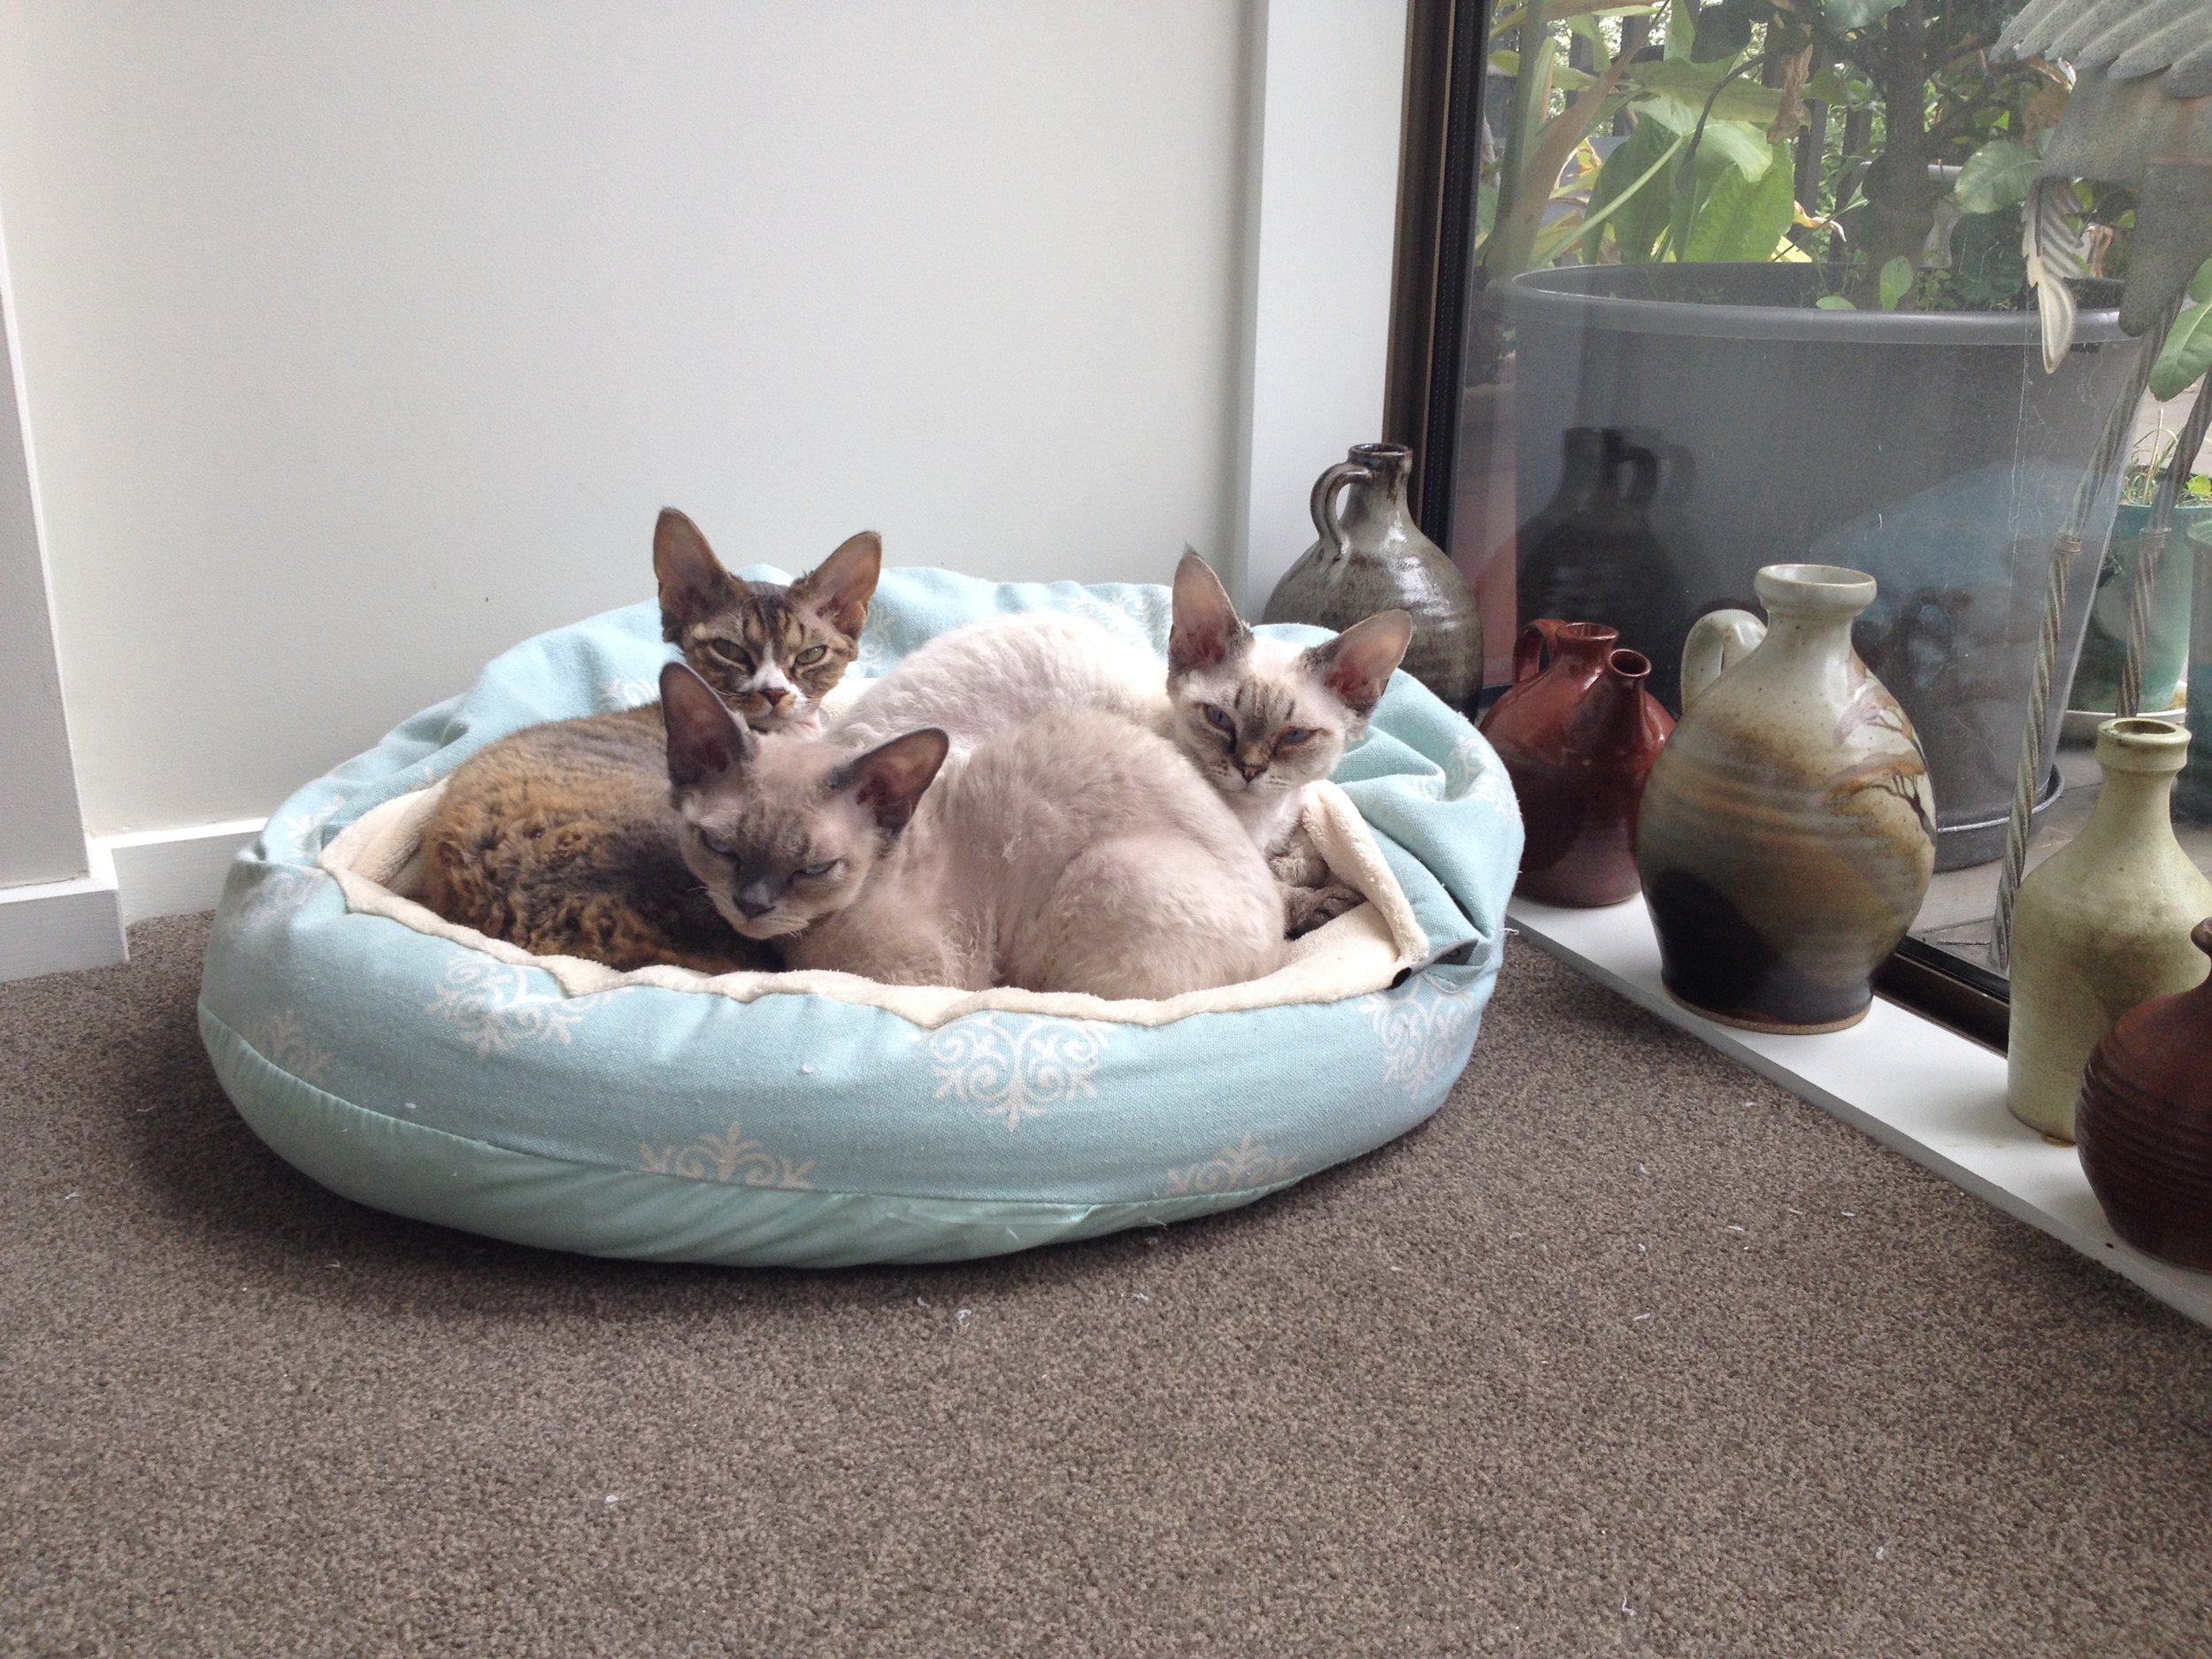 fuzzyard-cat-cubby-bed-juicy_large.jpg